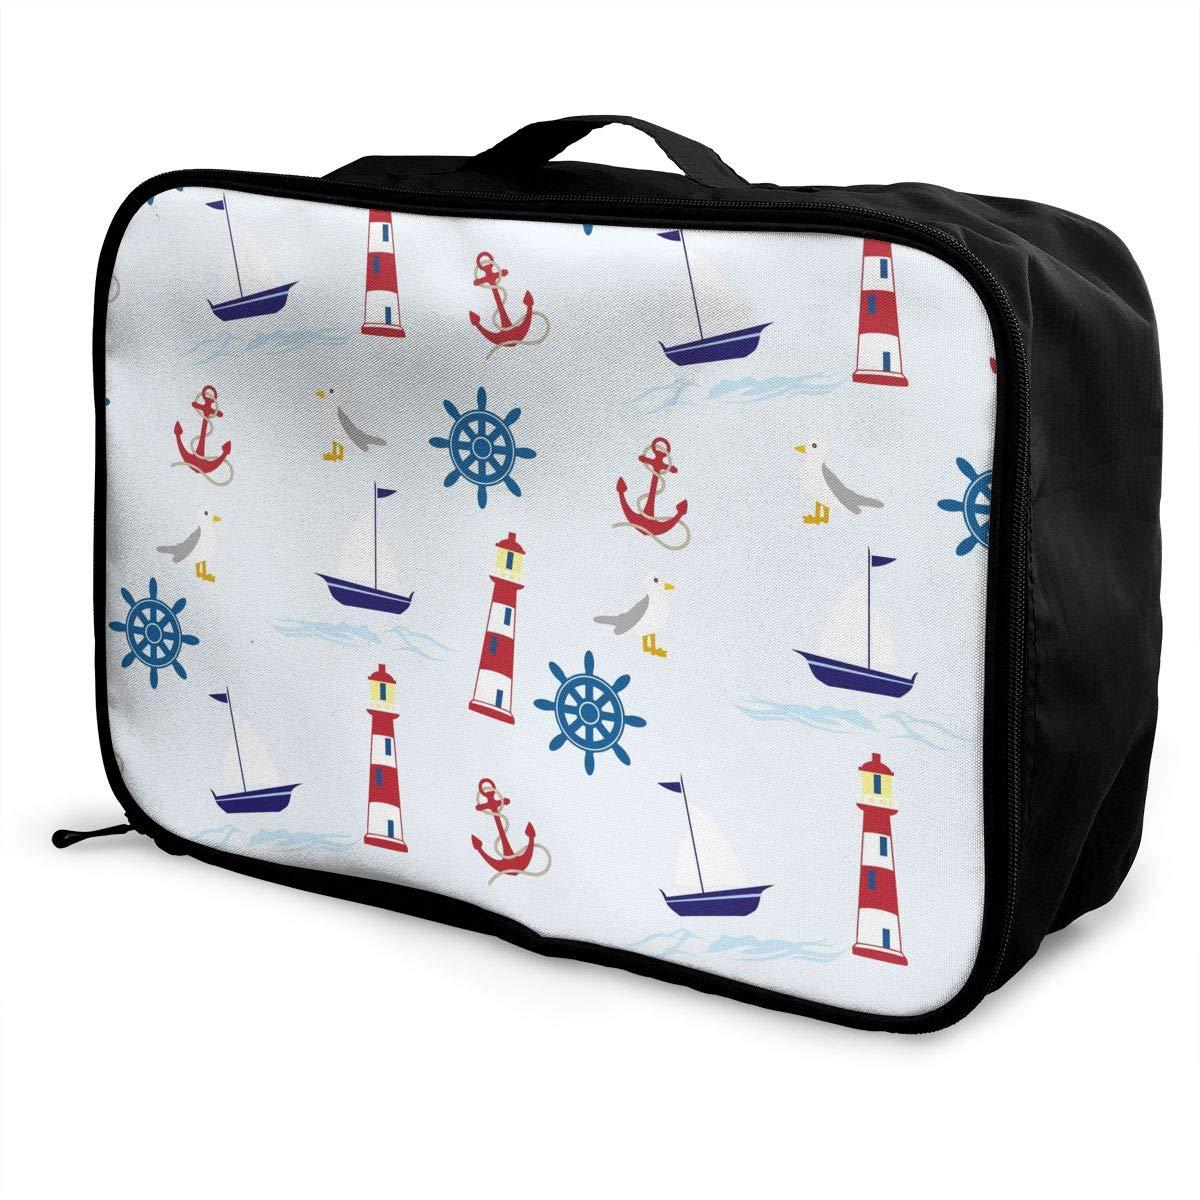 ADGAI Burritos Donuts Dog Canvas Travel Weekender Bag,Fashion Custom Lightweight Large Capacity Portable Luggage Bag,Suitcase Trolley Bag